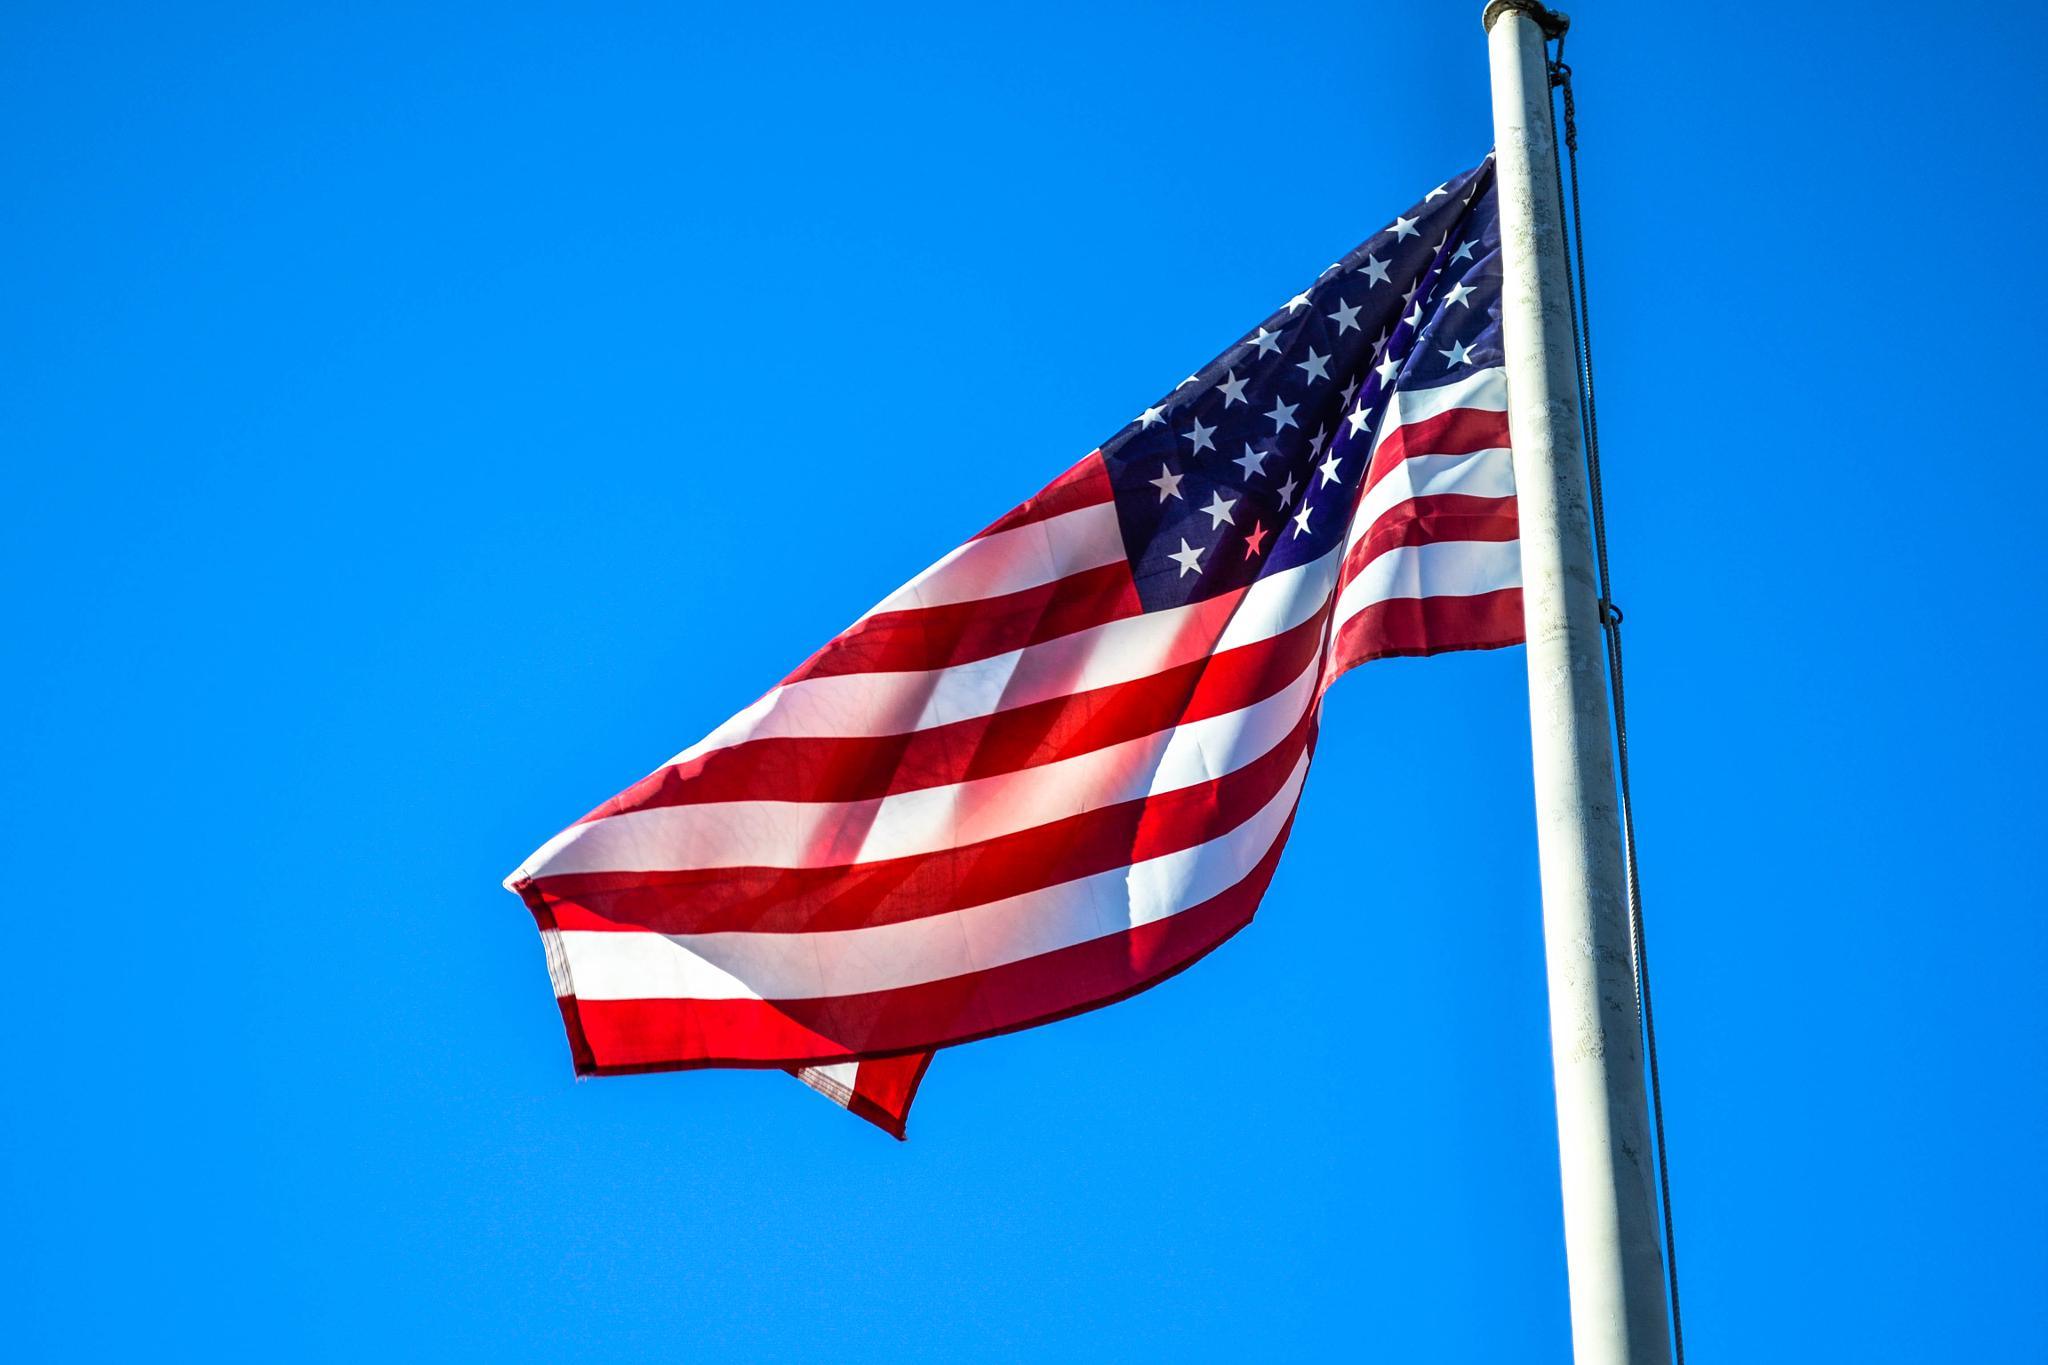 USA flag by jure kralj